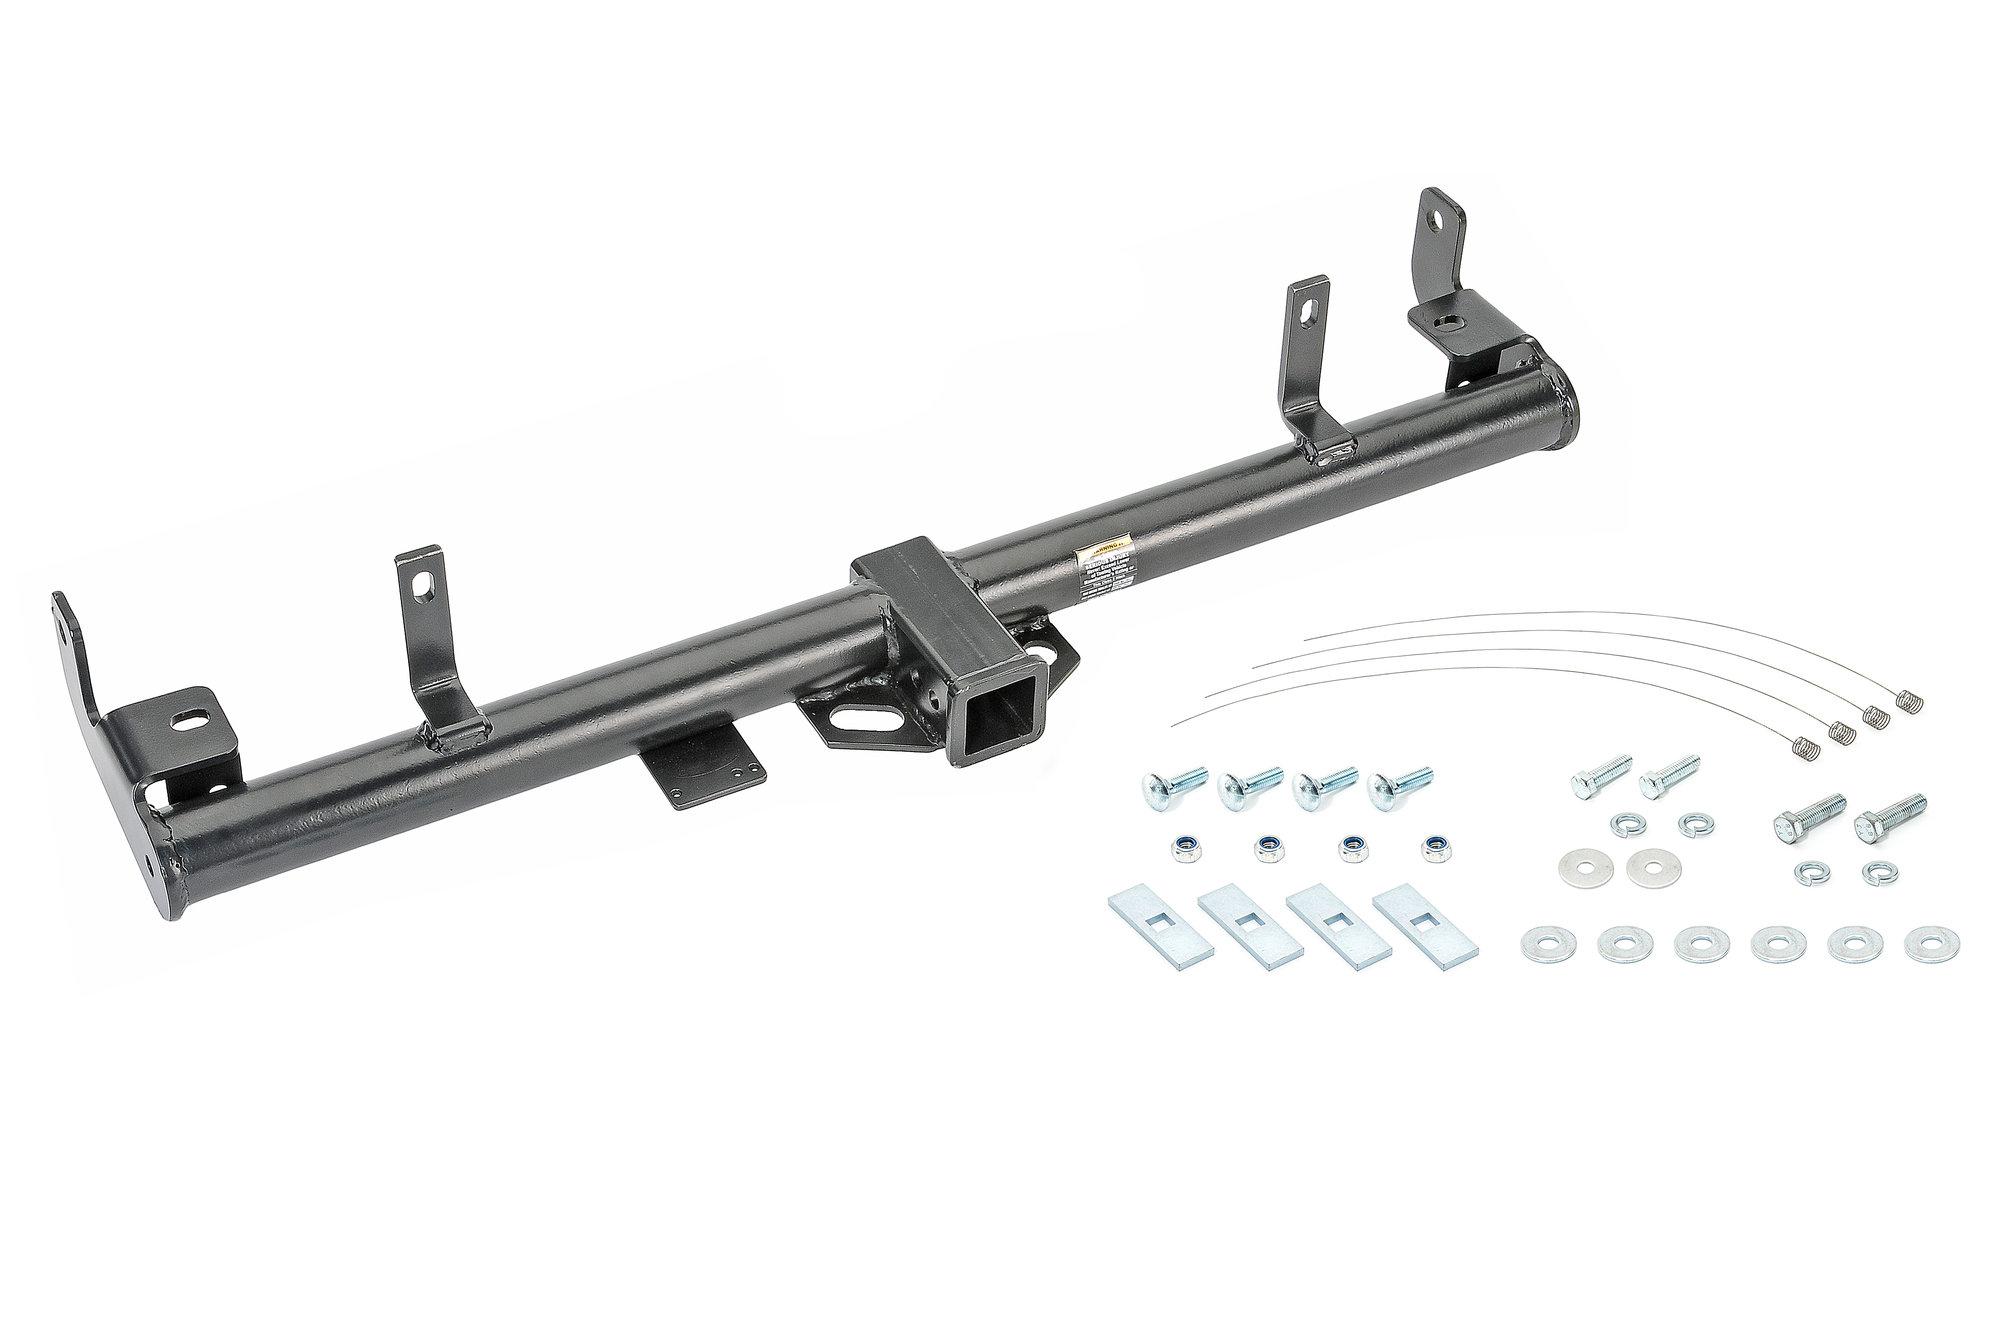 Quadratec Premium 2 Receiver Hitch Kit With Lightweight